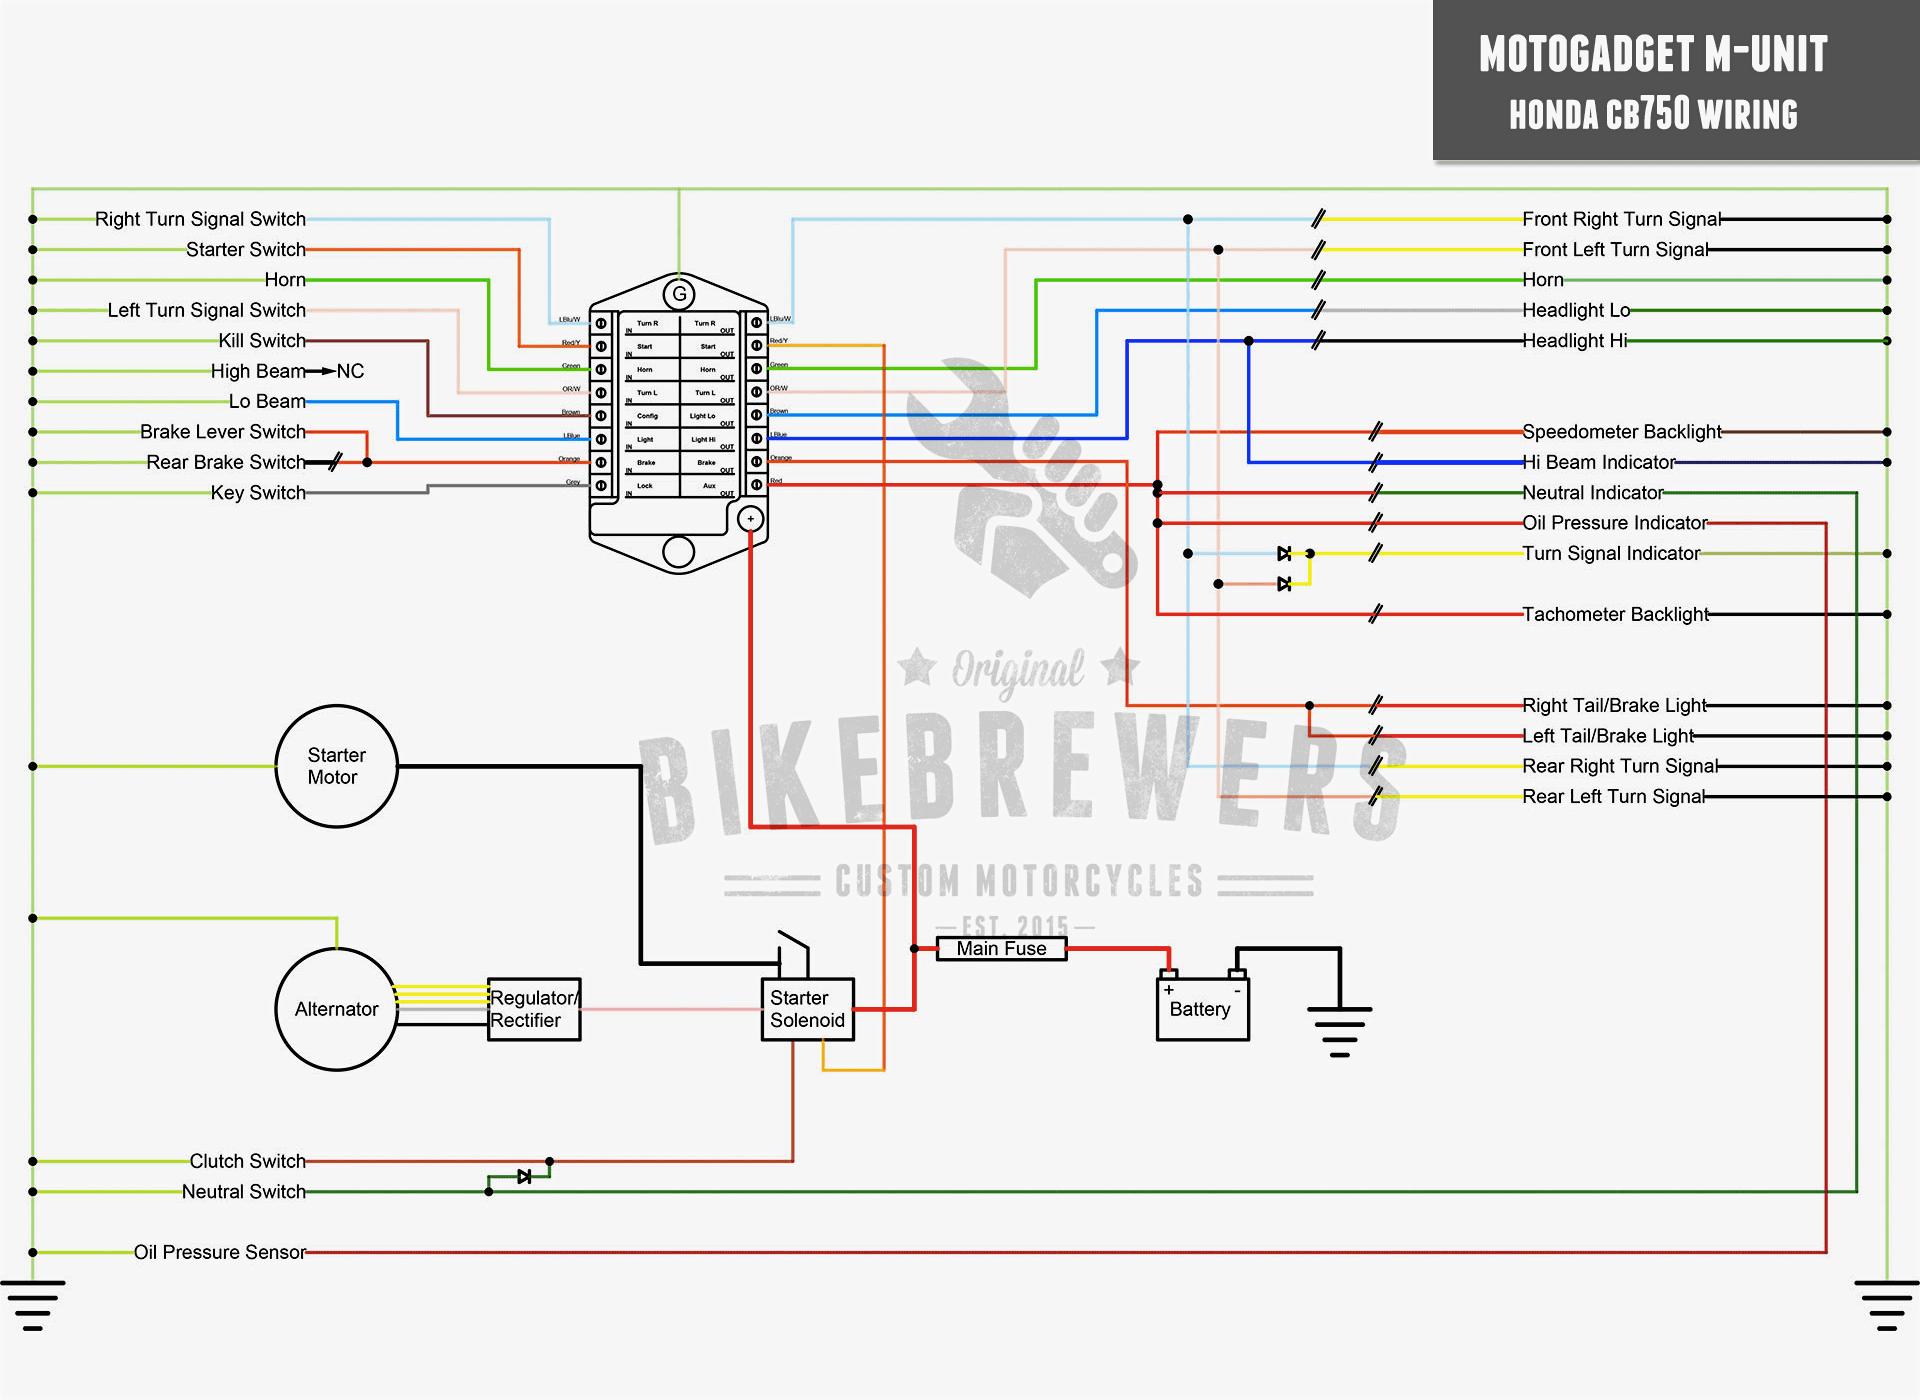 ☑ wiring diagram de taller jetta a4 20 gratis hd quality ☑ arrow-diagram .twirlinglucca.it  twirlinglucca.it